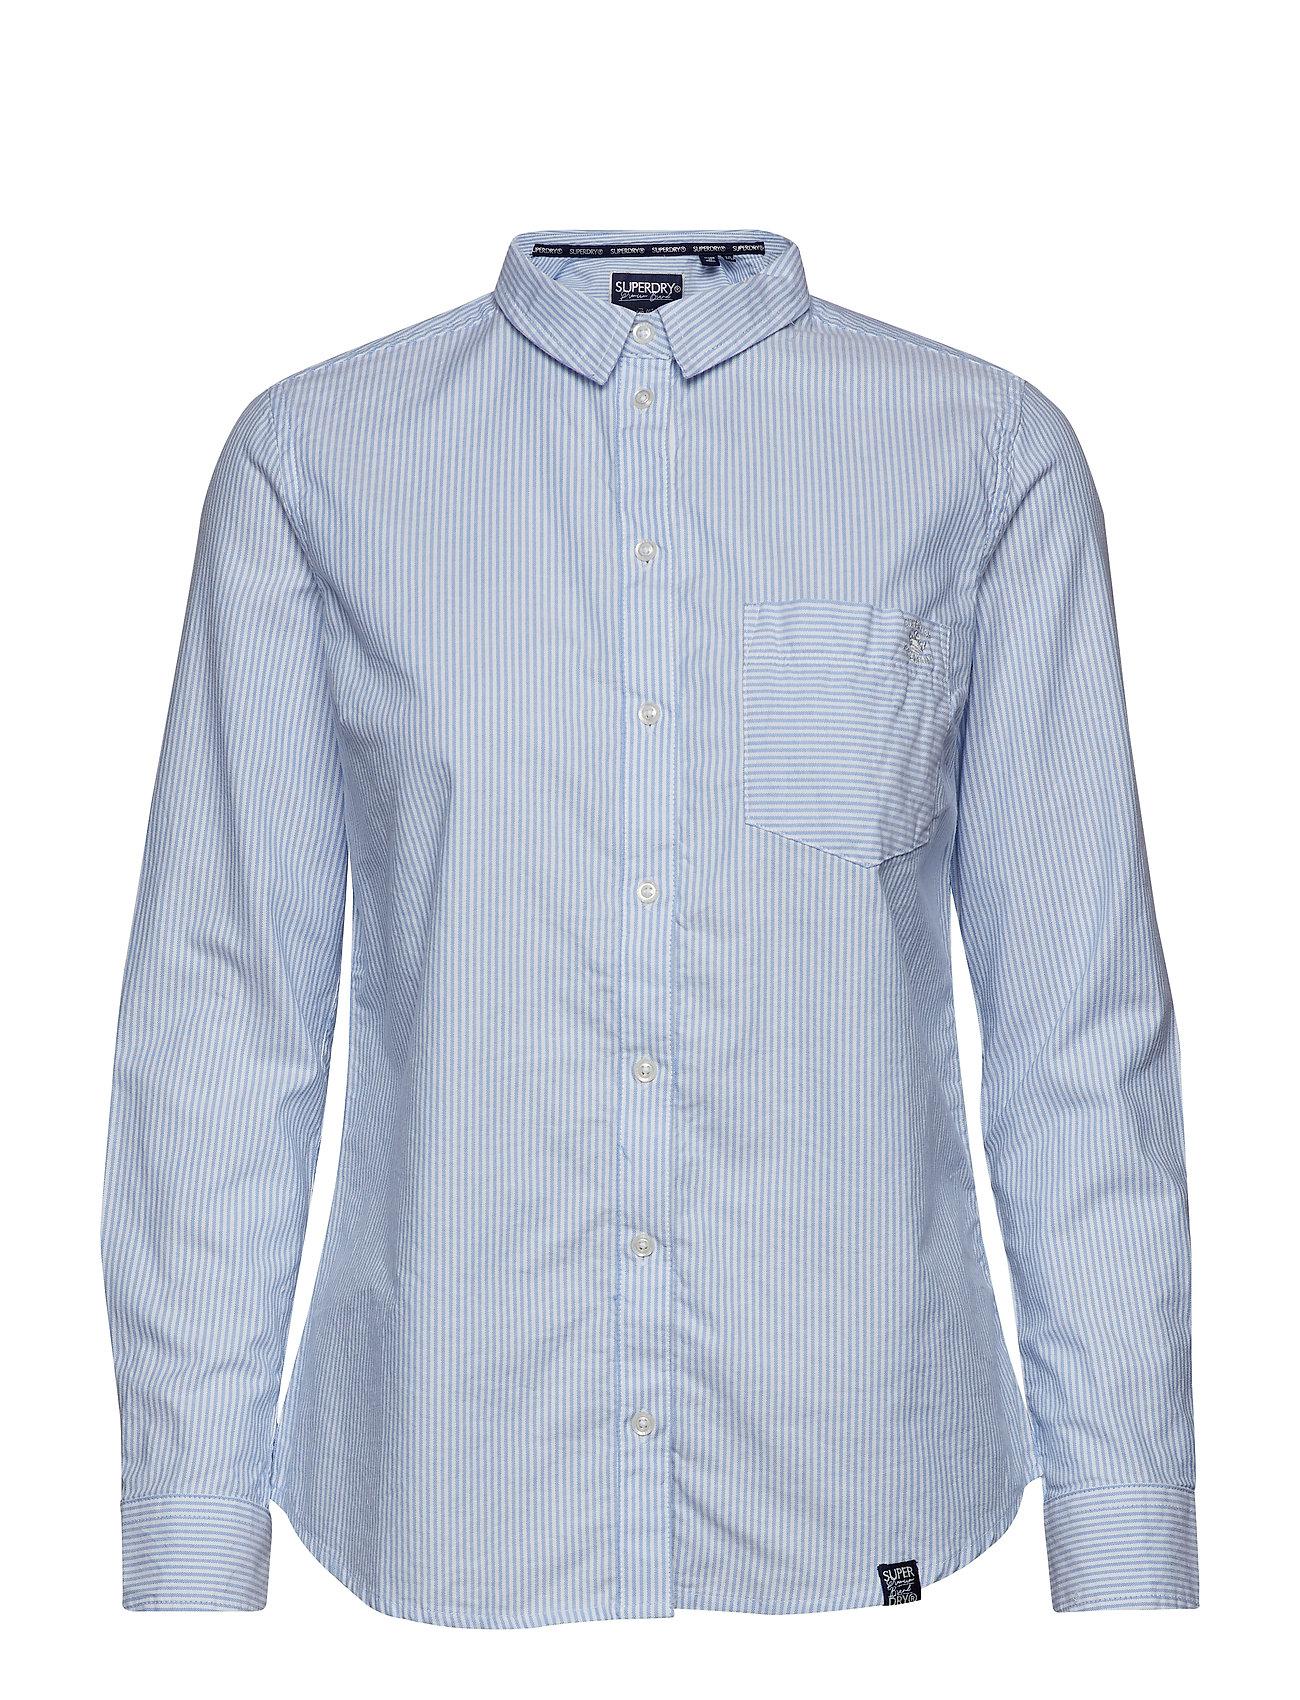 Stripe StripeSuperdry Oxford Shirtblue StripeSuperdry Oxford Stripe Shirtblue A435RLj